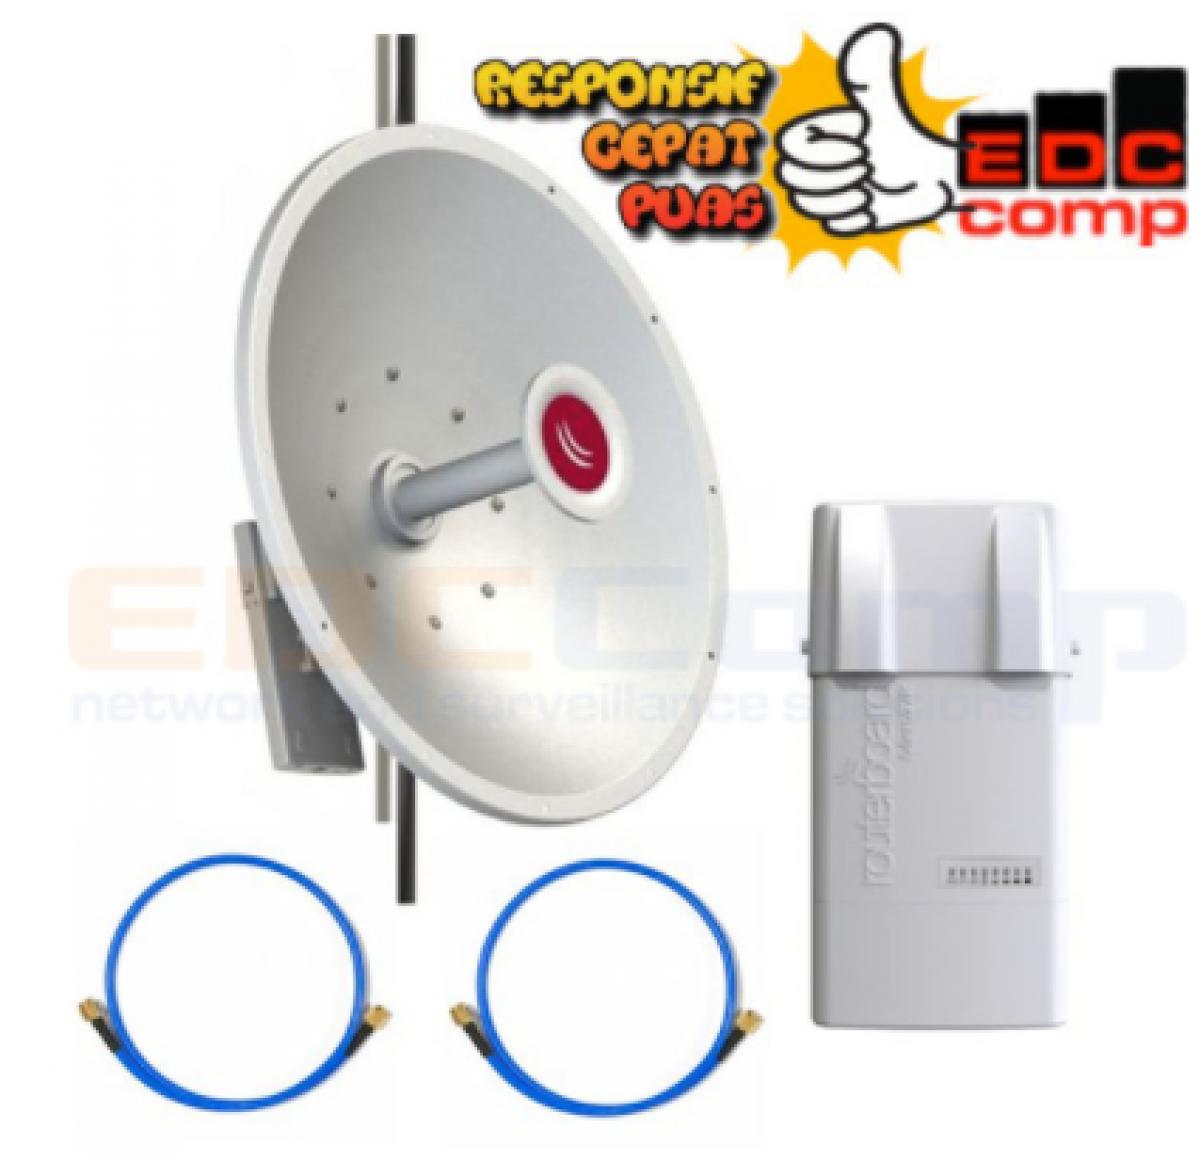 PAKET Mikrotik RB912UAG-5HPnD-OUT Basebox 5 & MTAD-5G-30D3 mANT30 - EdcComp